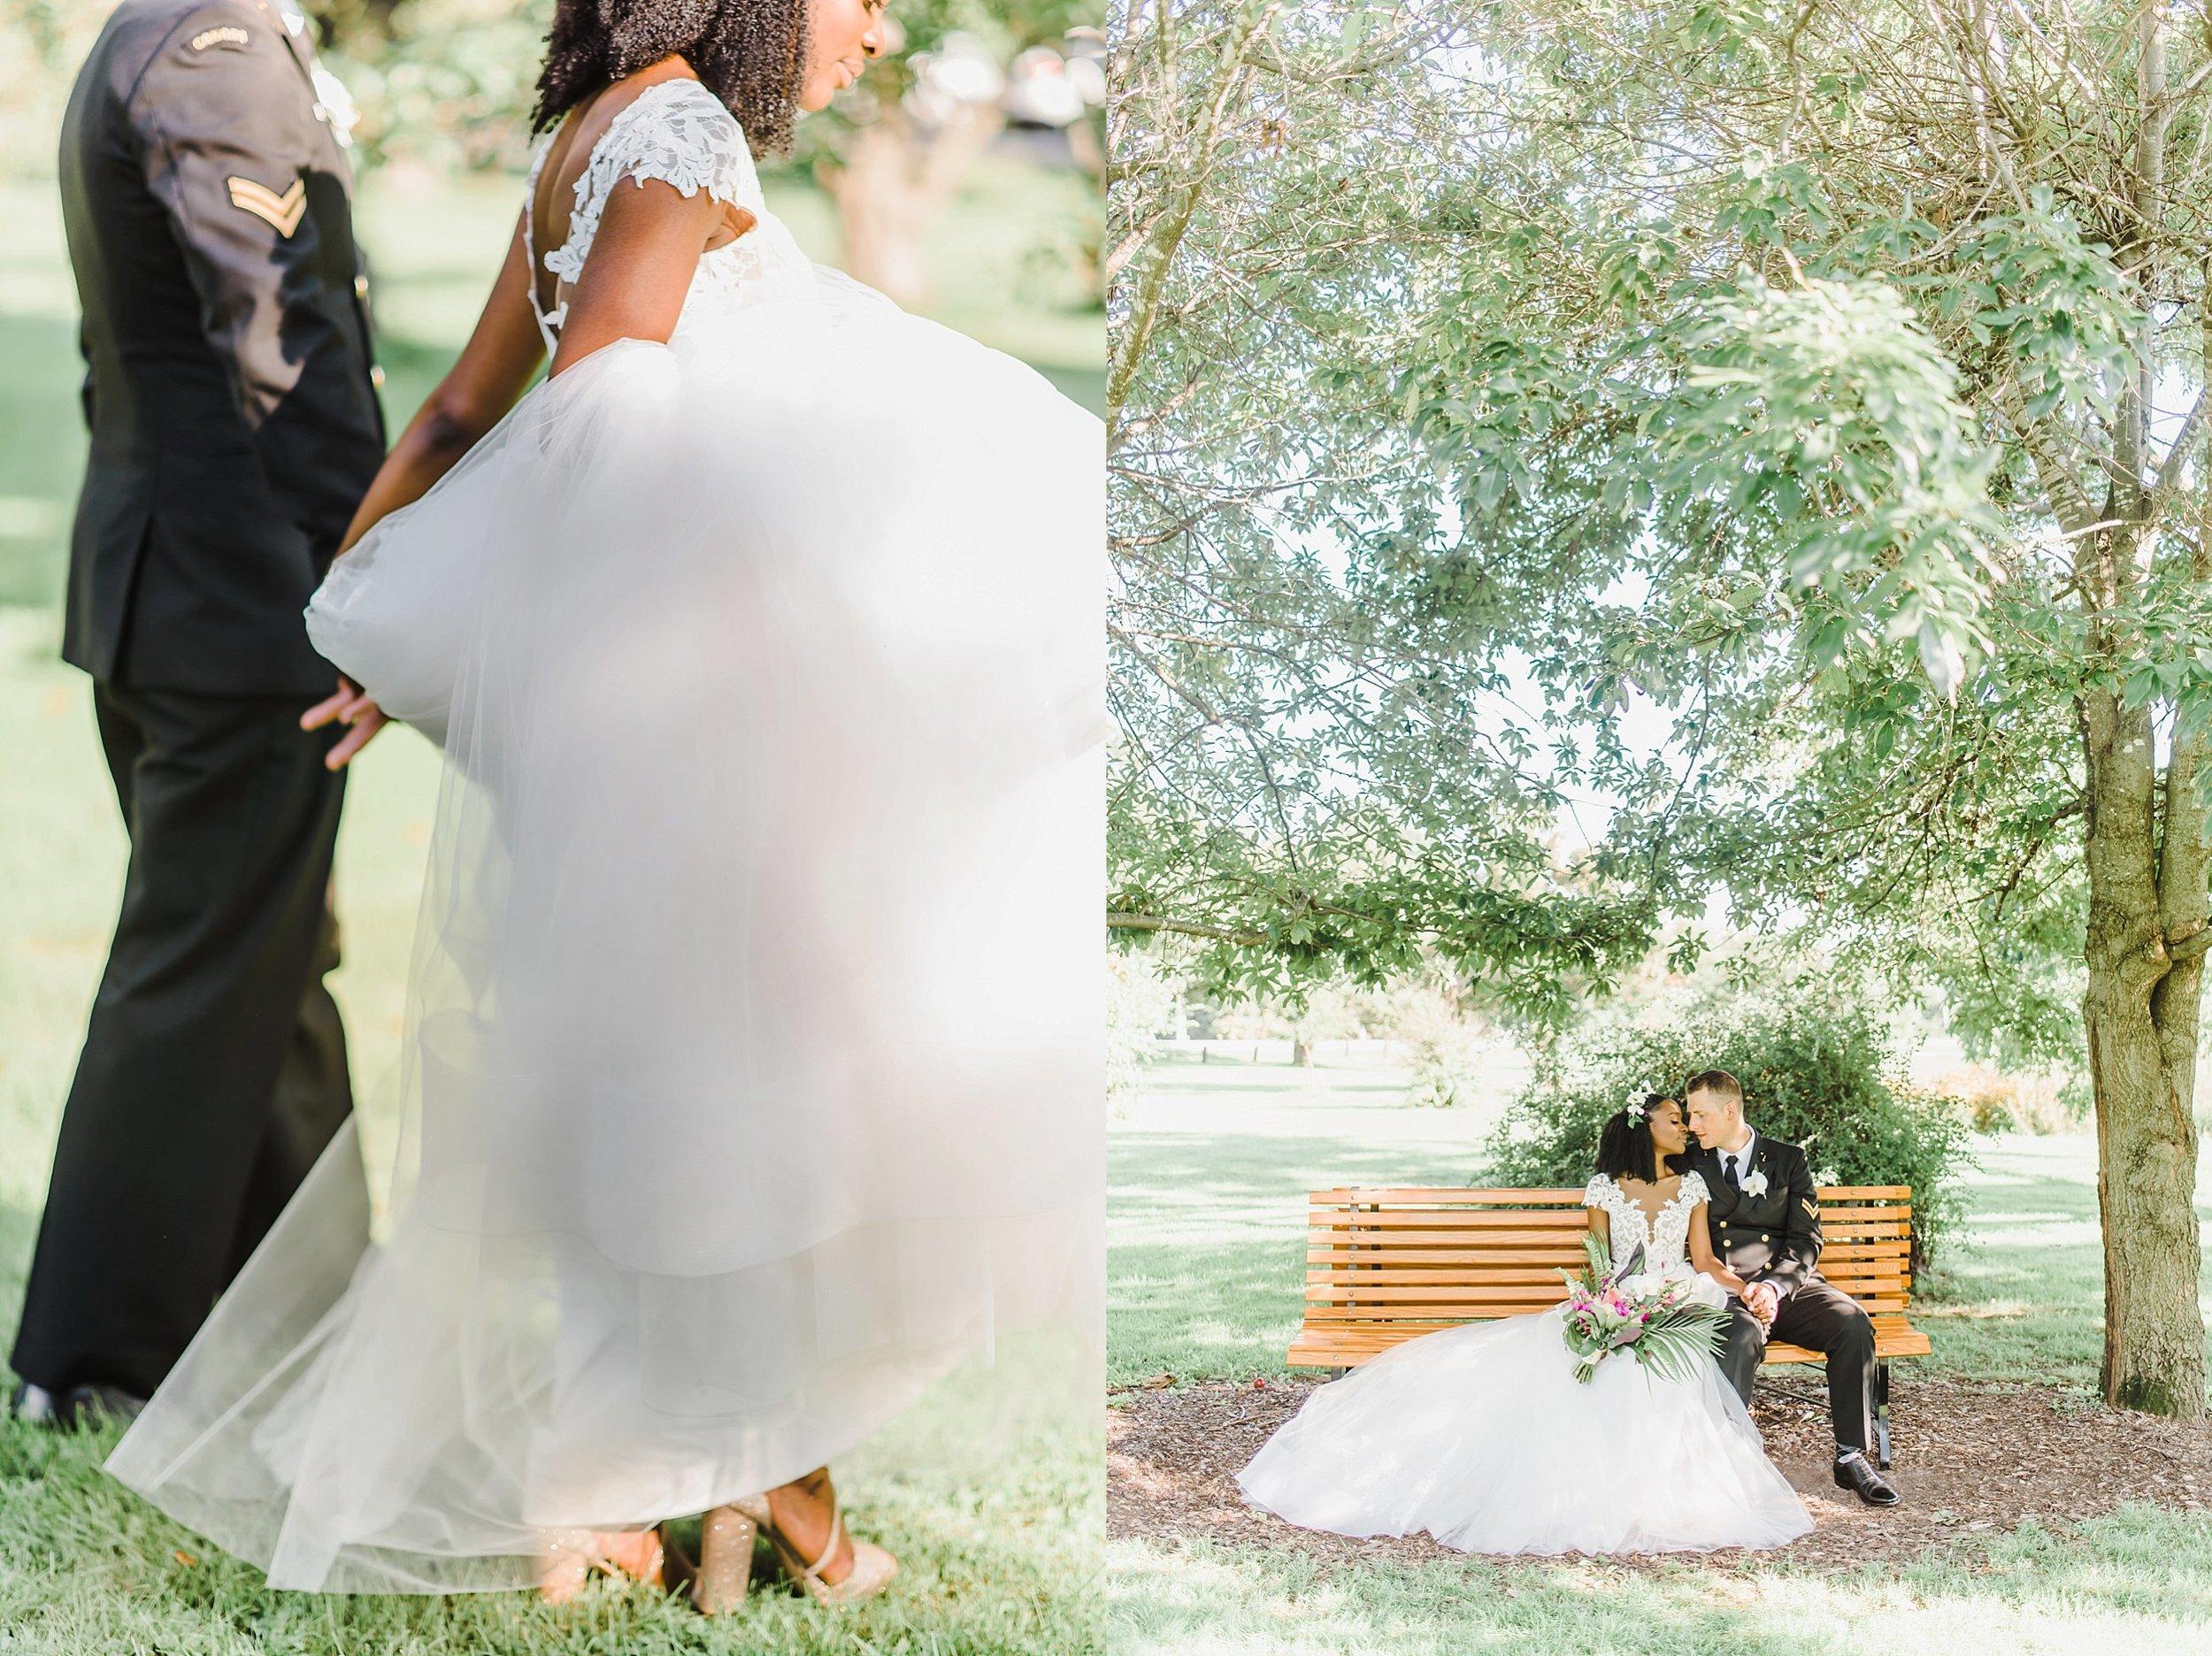 light airy indie fine art ottawa wedding photographer | Ali and Batoul Photography_1000.jpg